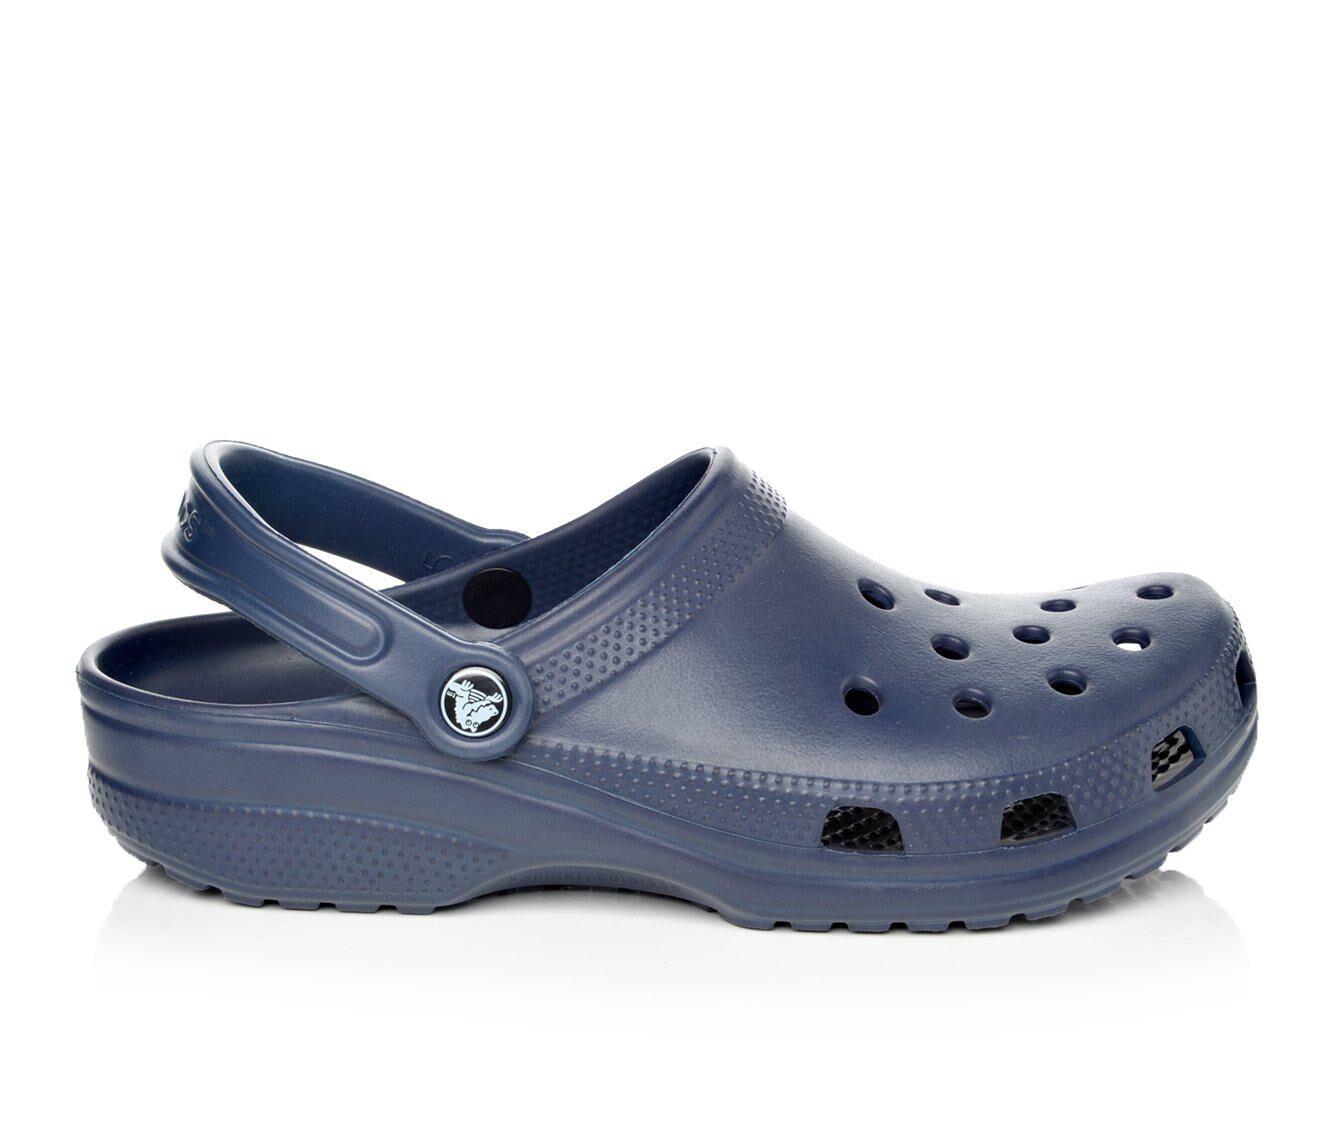 Women's Crocs Classic Clogs Navy